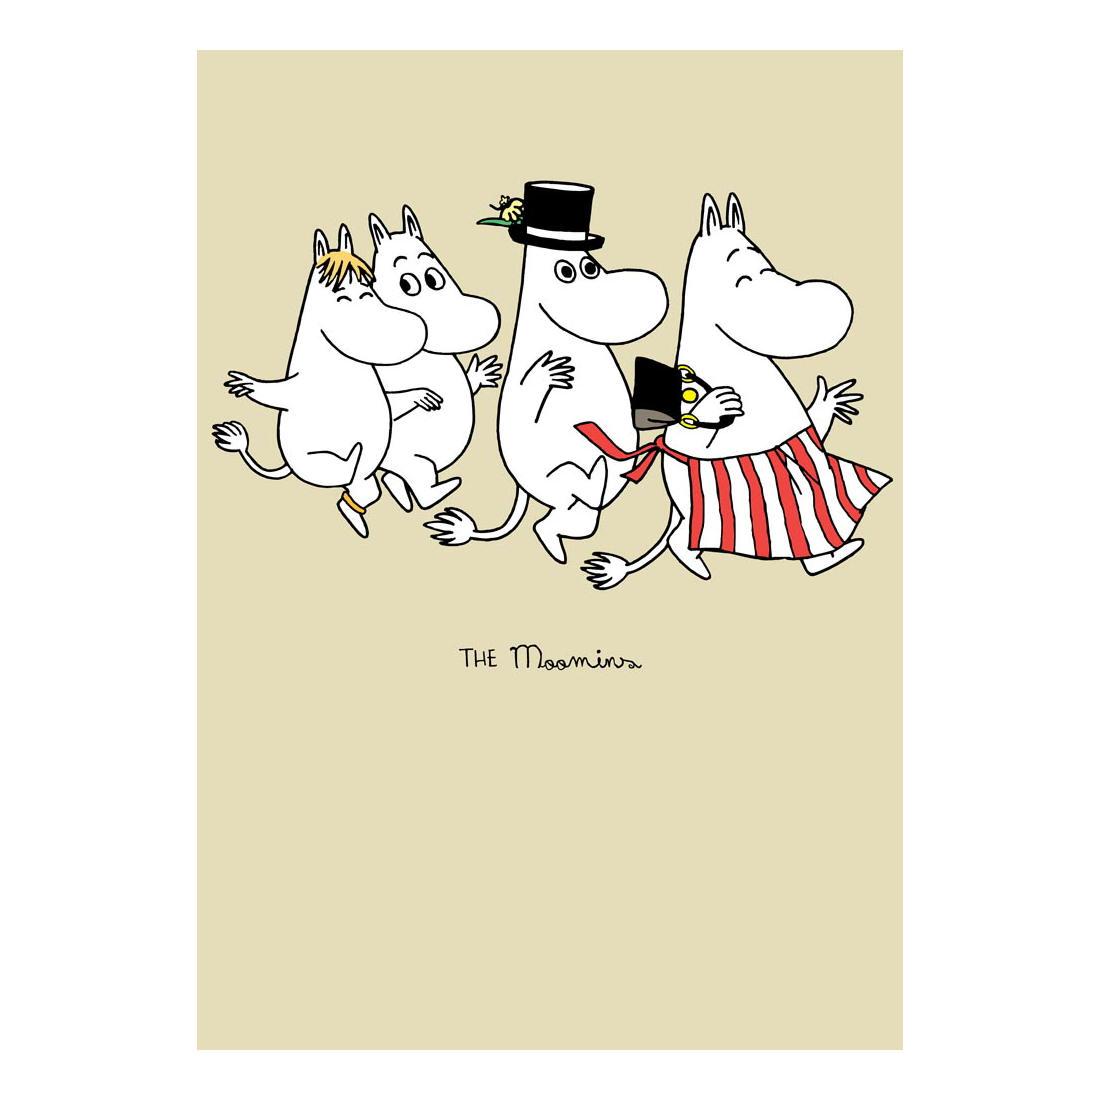 Skipping moomin family greeting card birthday tove jansson